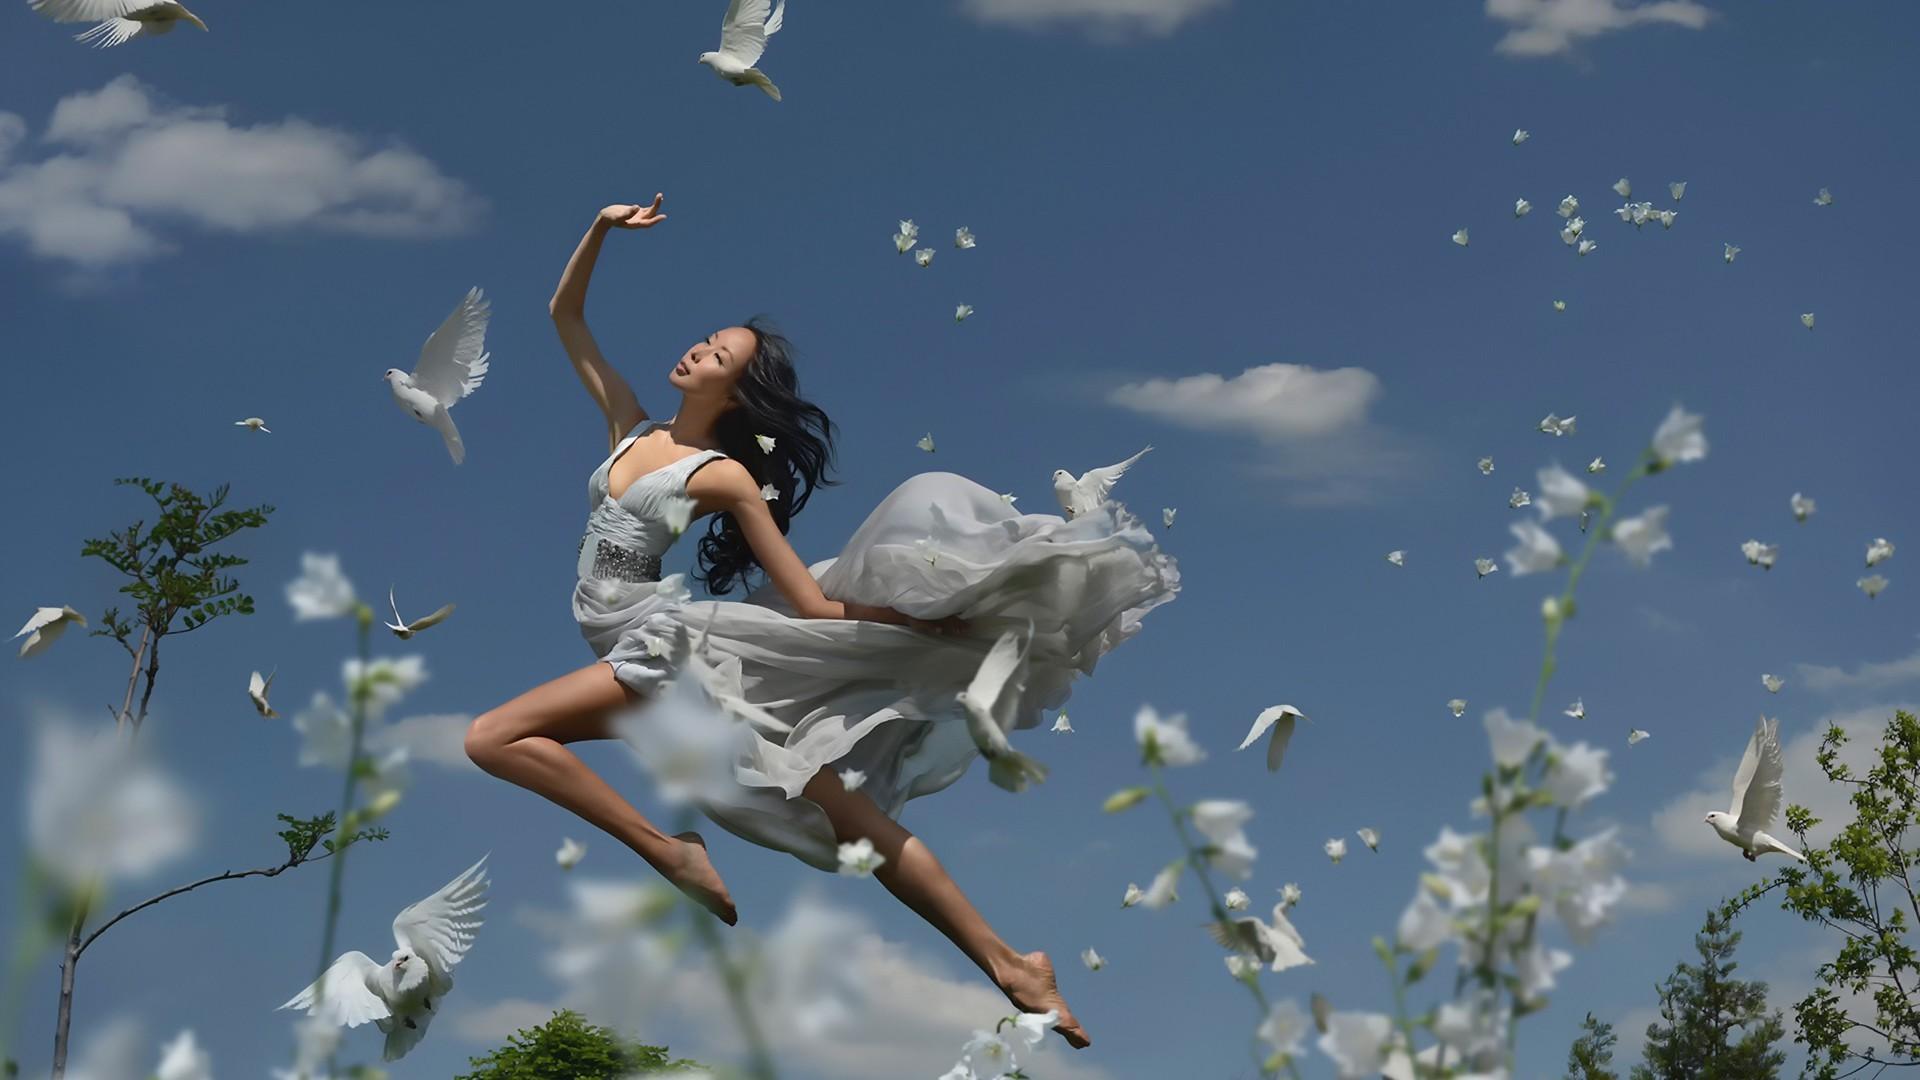 Цветы летящие в небе фото